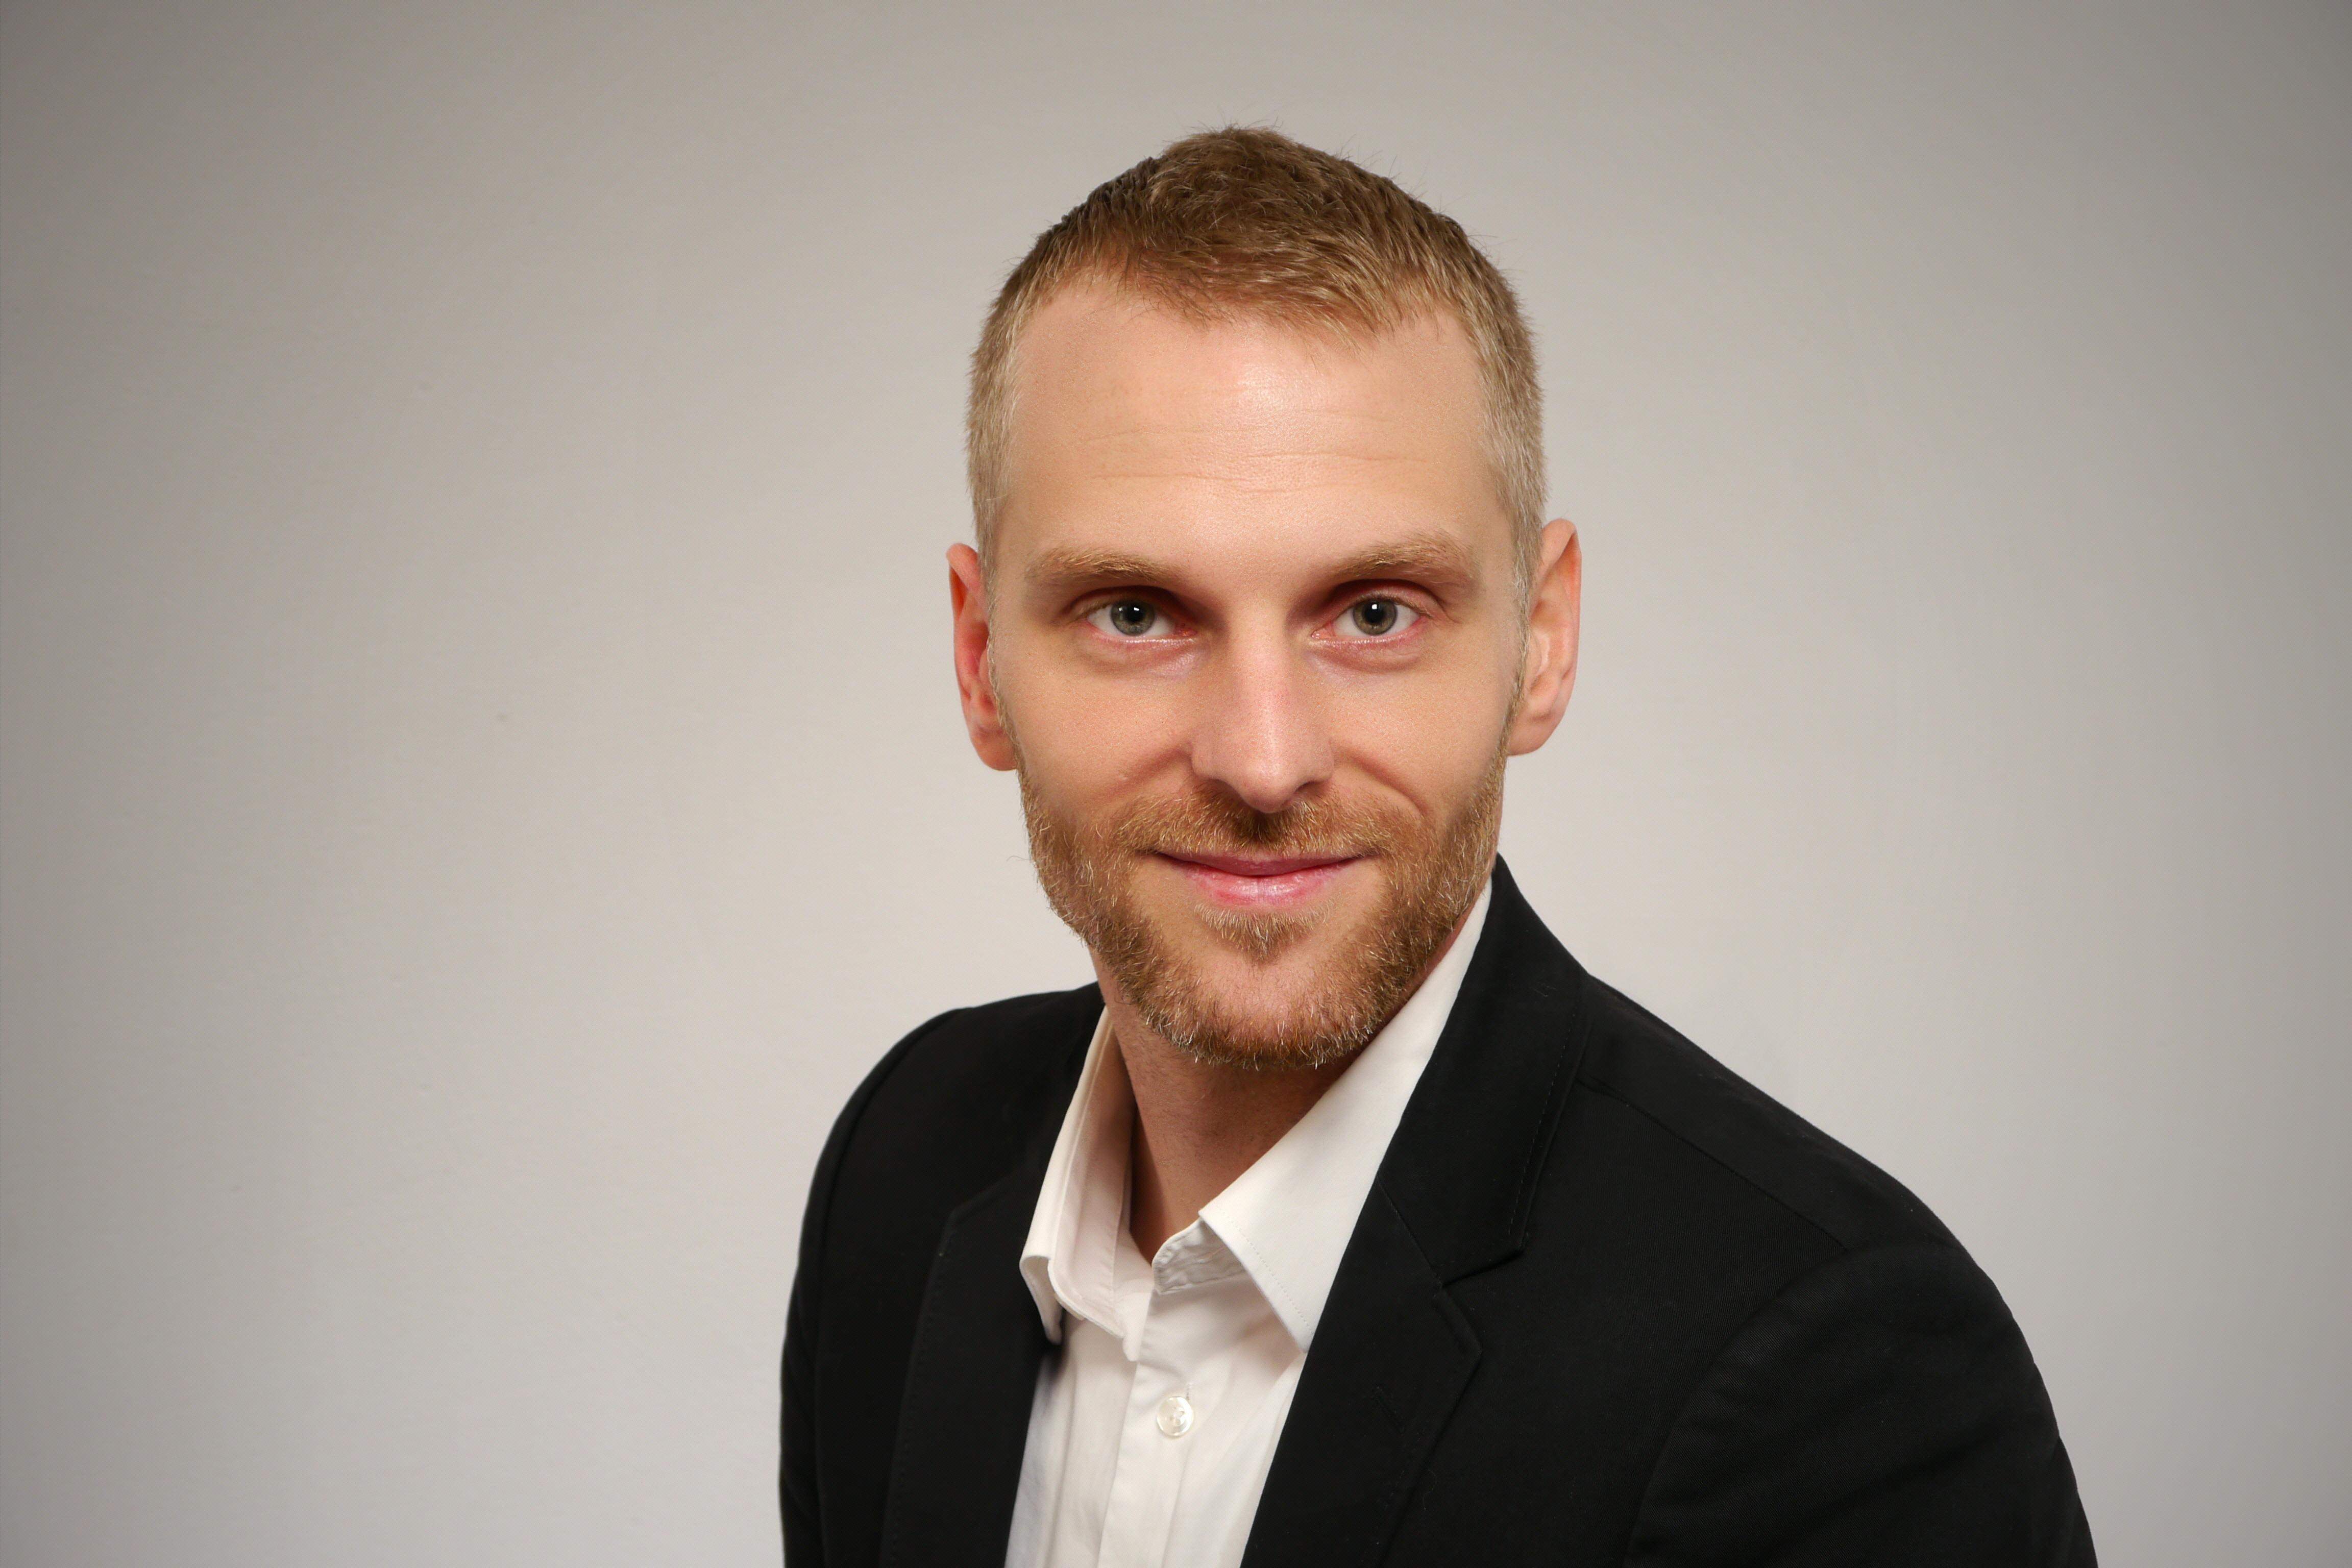 Matthias Barth